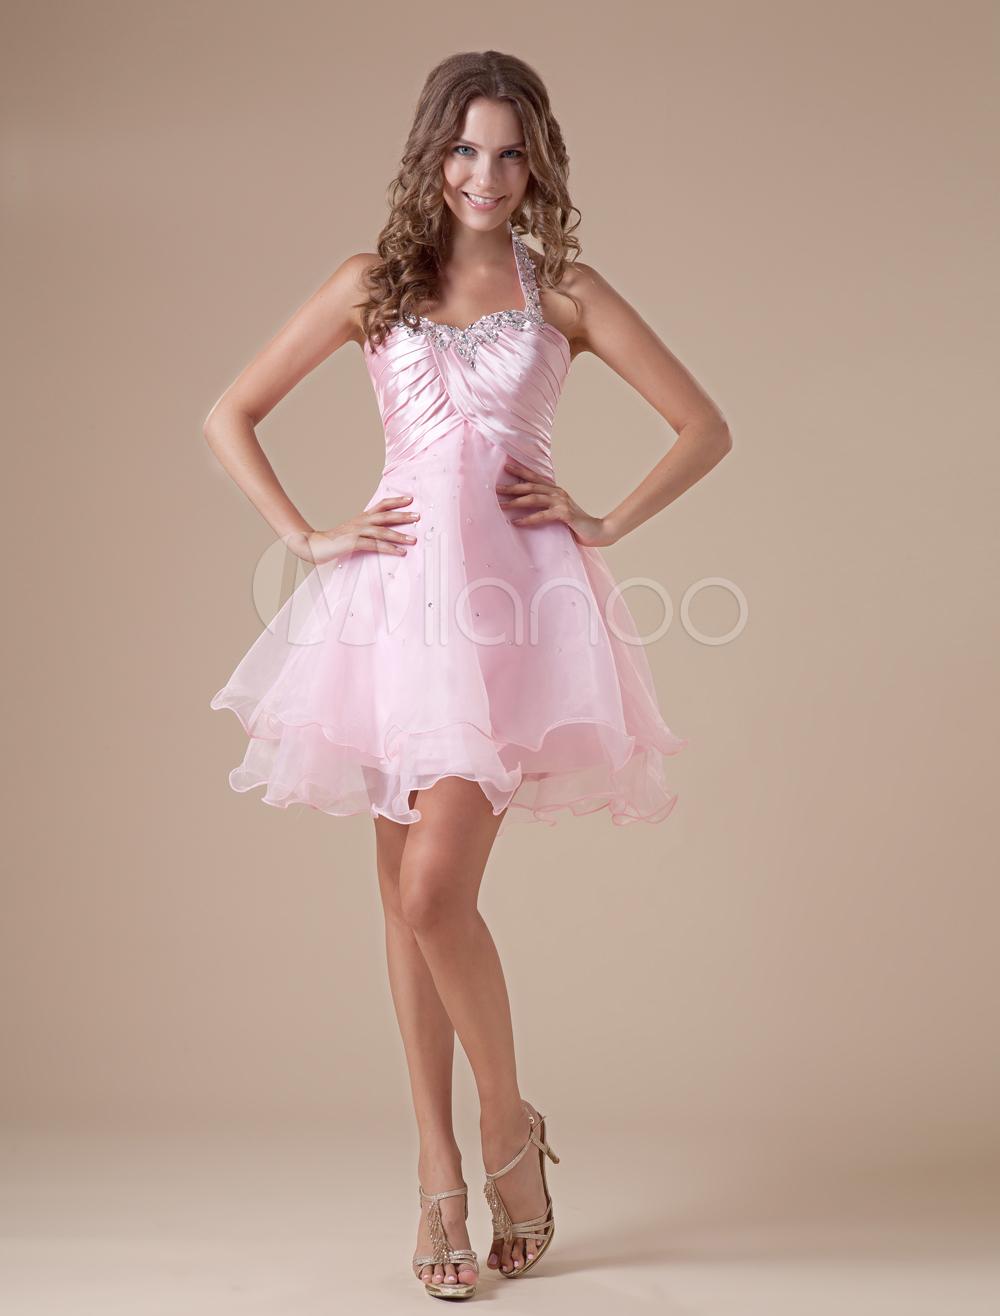 Elegant Short Pink Halter Tulle Womens Homecoming Dress (Wedding Cheap Party Dress) photo